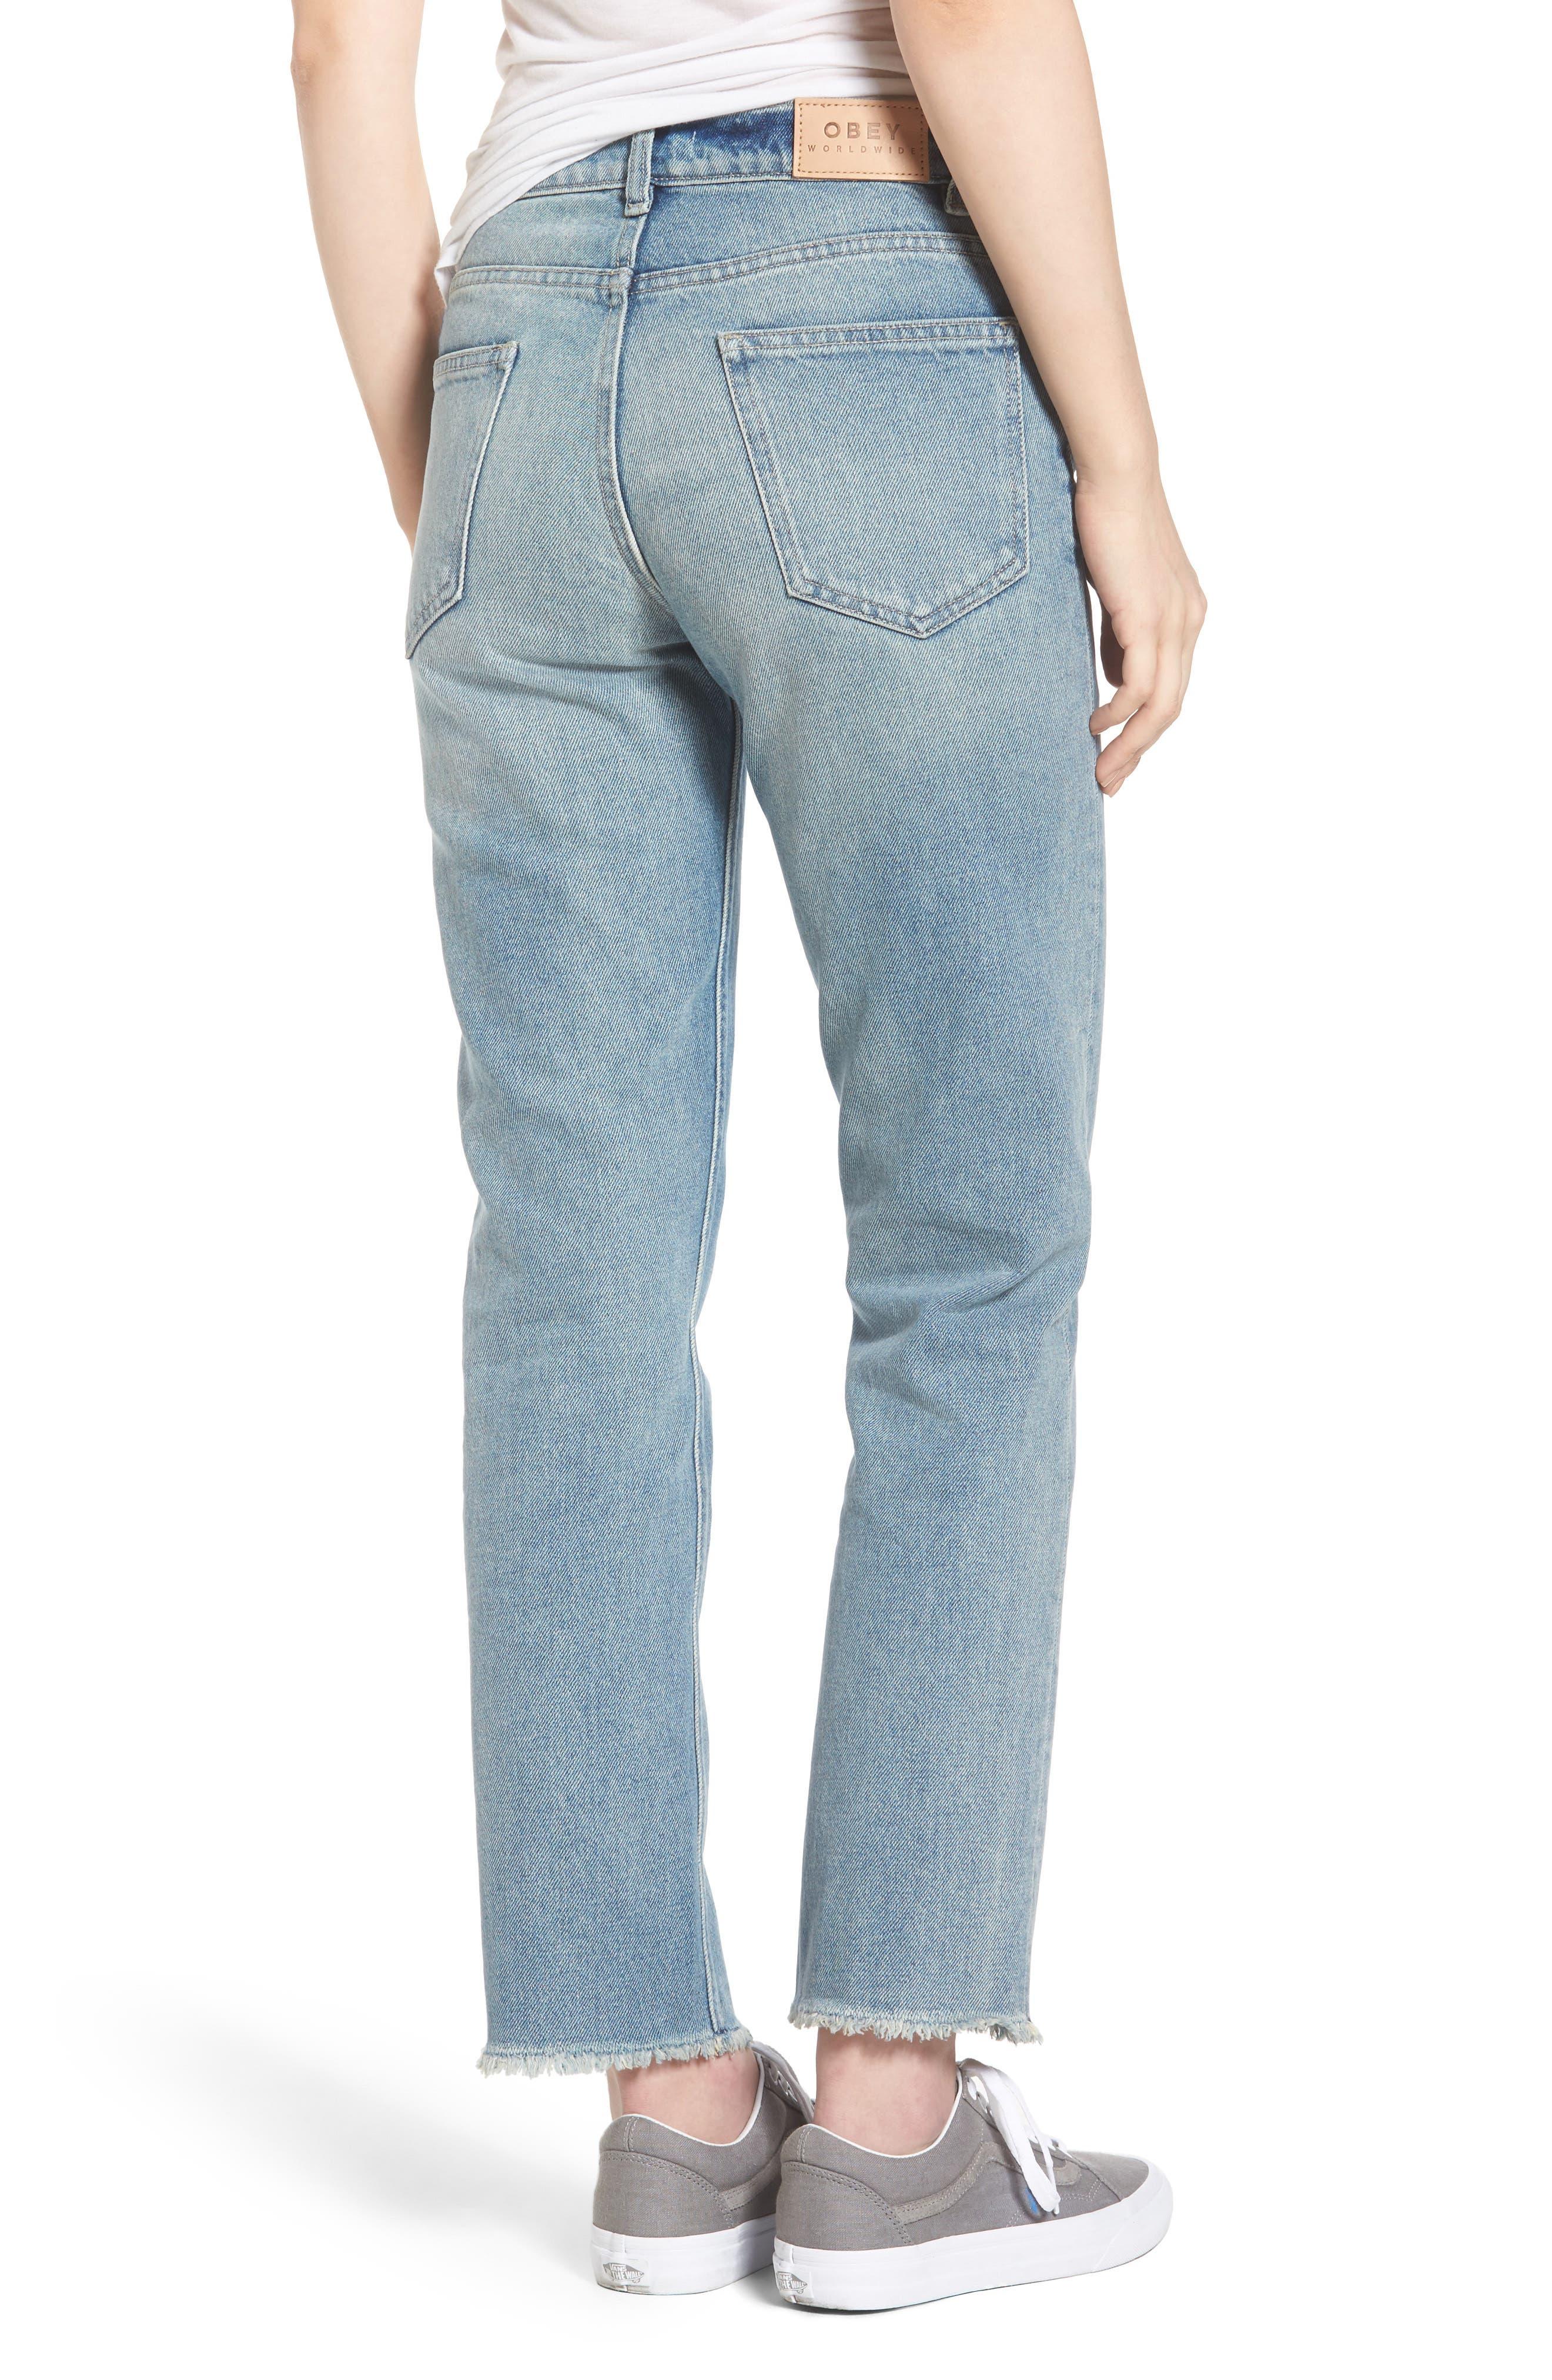 Sundays Straggler High Waist Jeans,                             Alternate thumbnail 2, color,                             400